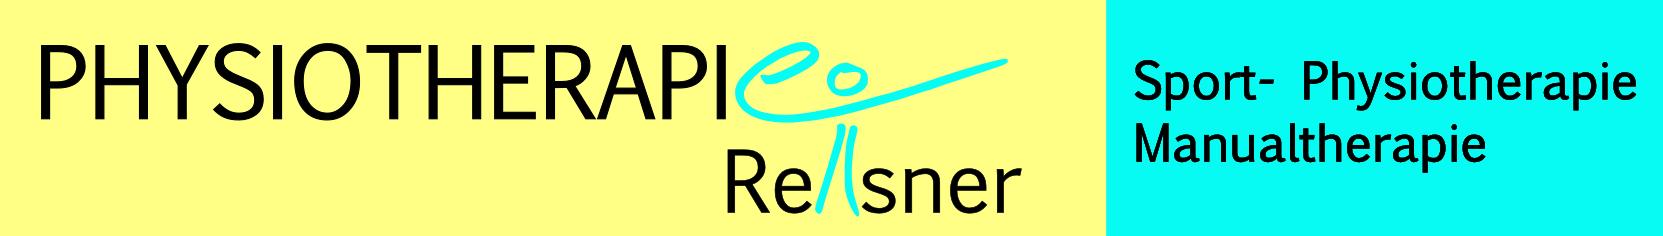 Physiotherapie Reisner